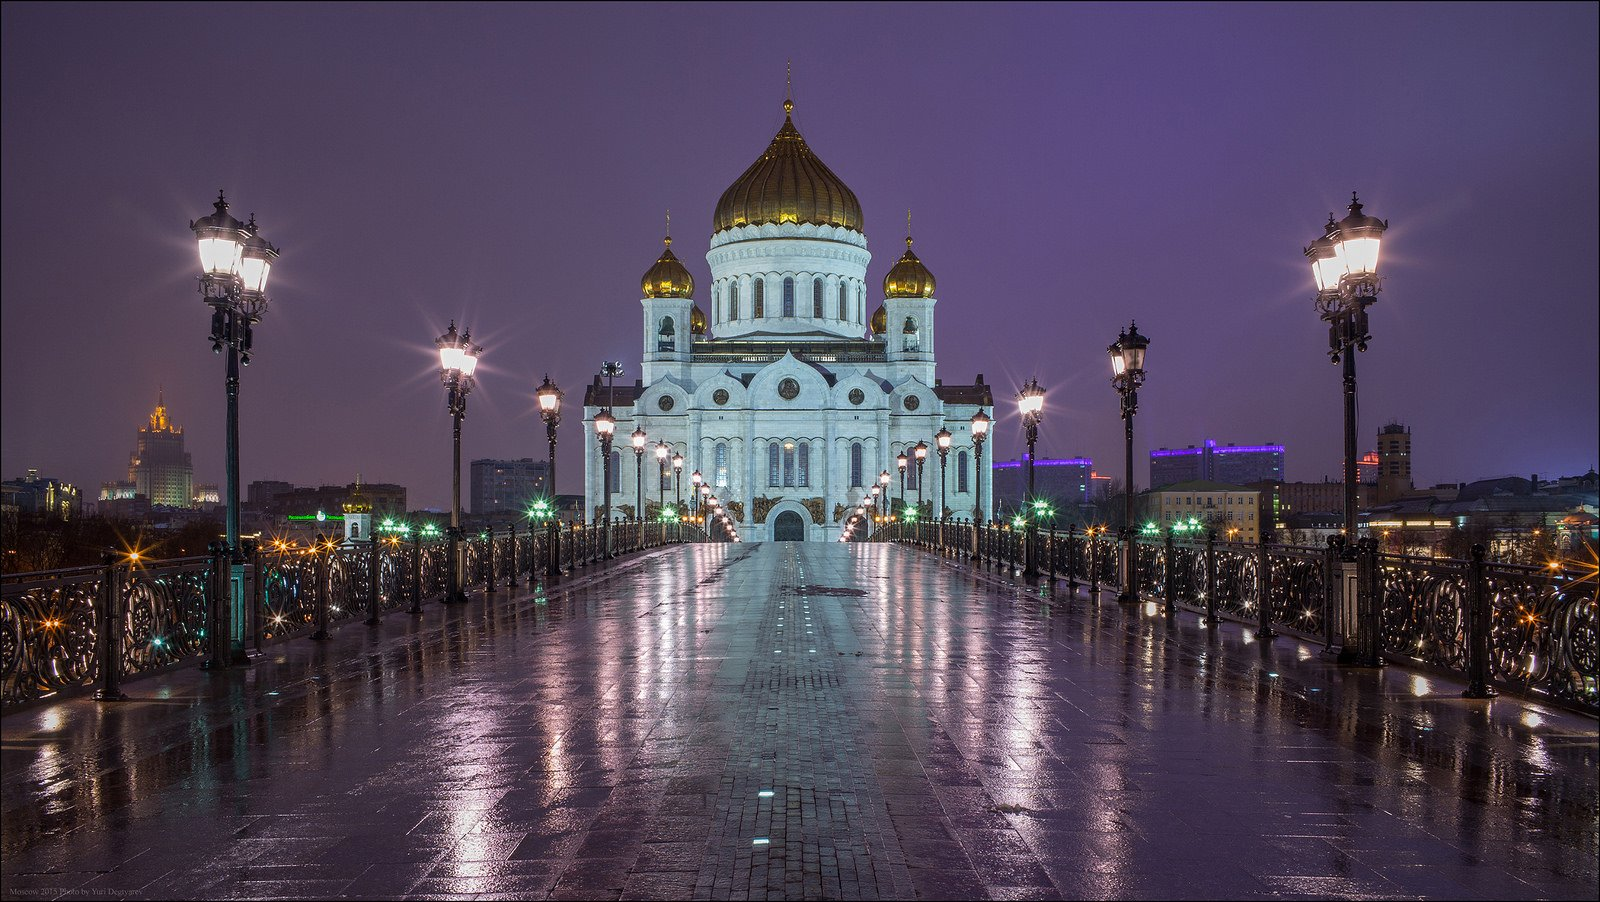 город, дождь, москва, мост, патриарший, россия, утро, фонари, храм, храм христа спасителя, Юрий Дегтярёв